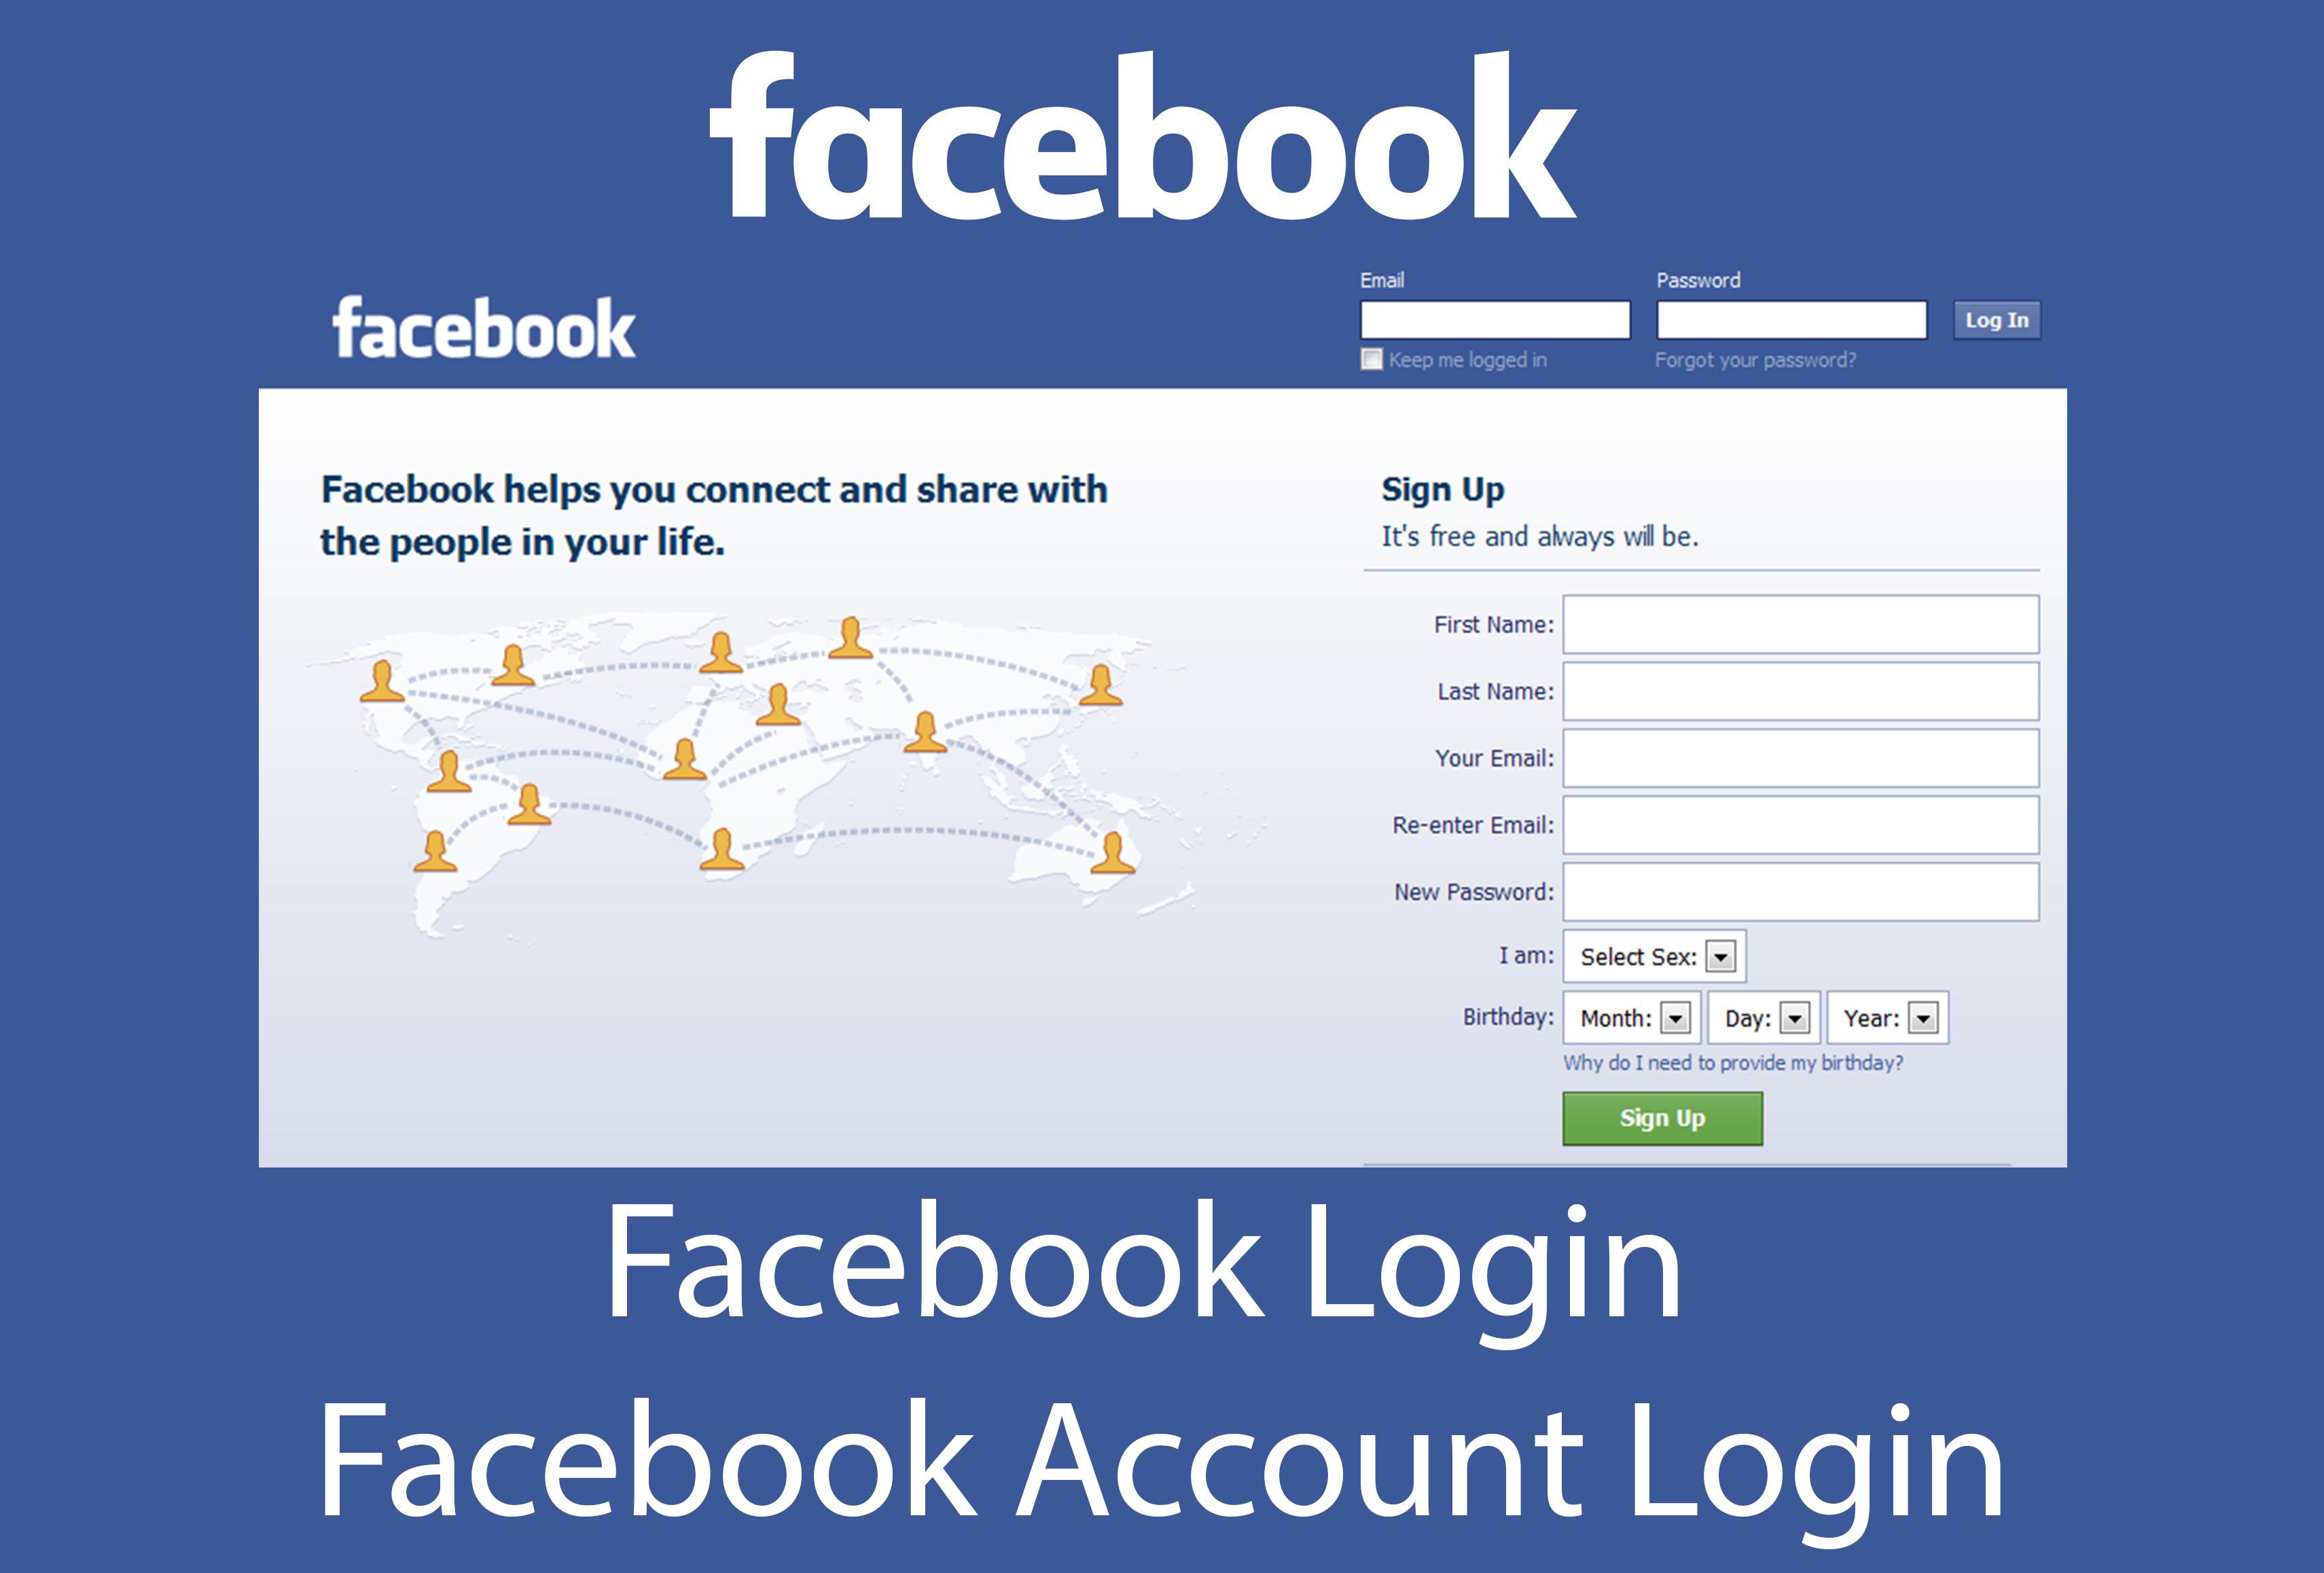 My facebook login sign up